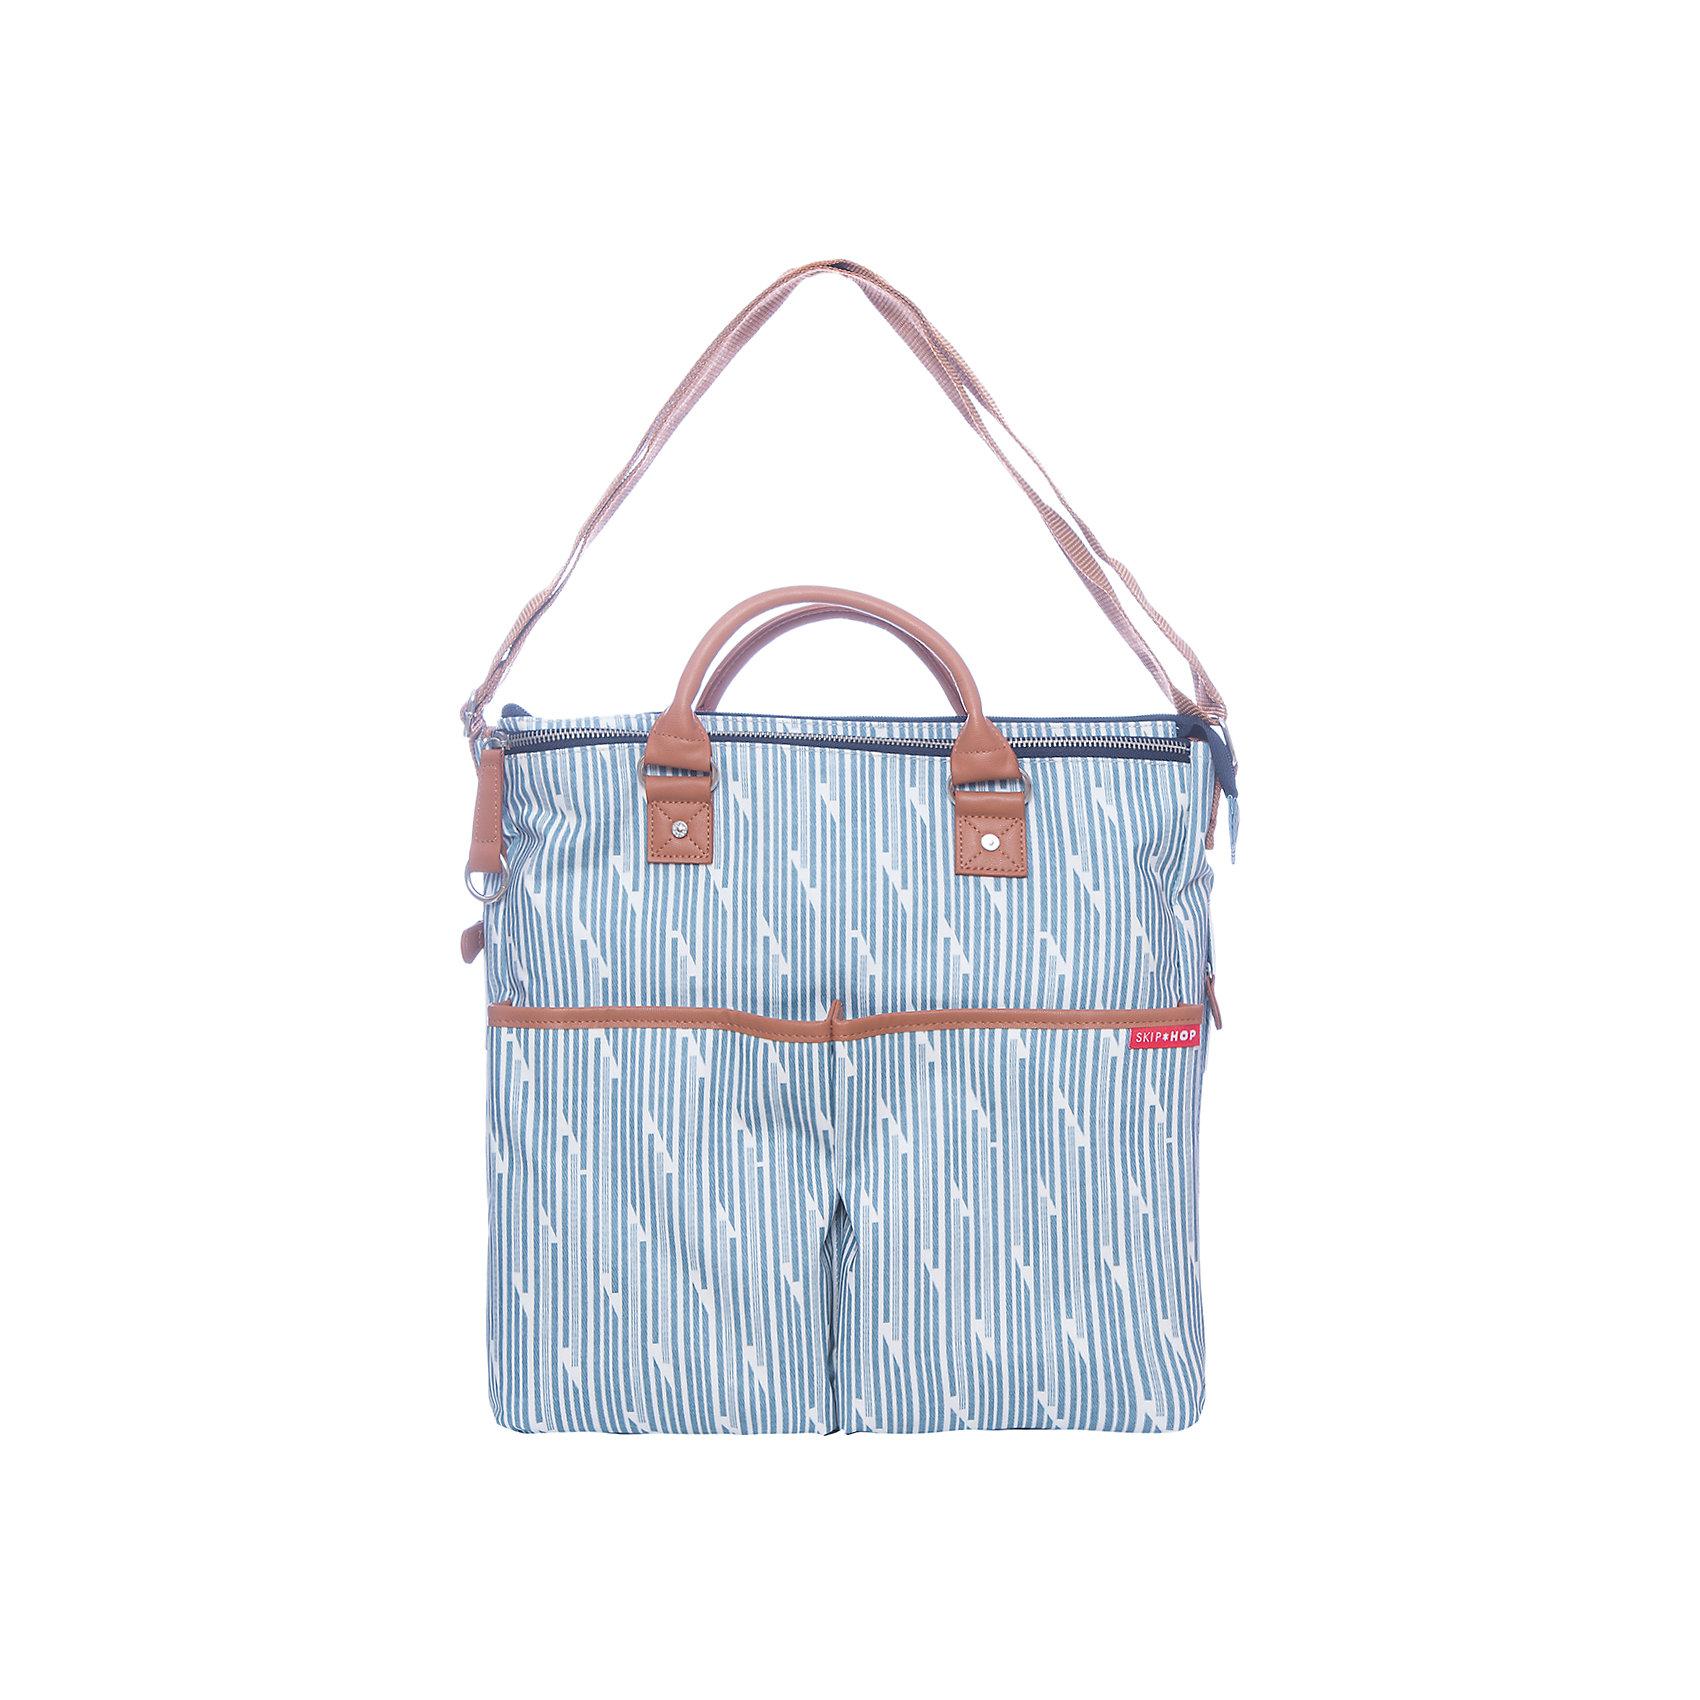 SkipHop Сумка для мамы на коляску, SkipHop сумки для мамы petunia pickle bottom сумка для мамы downtown tote